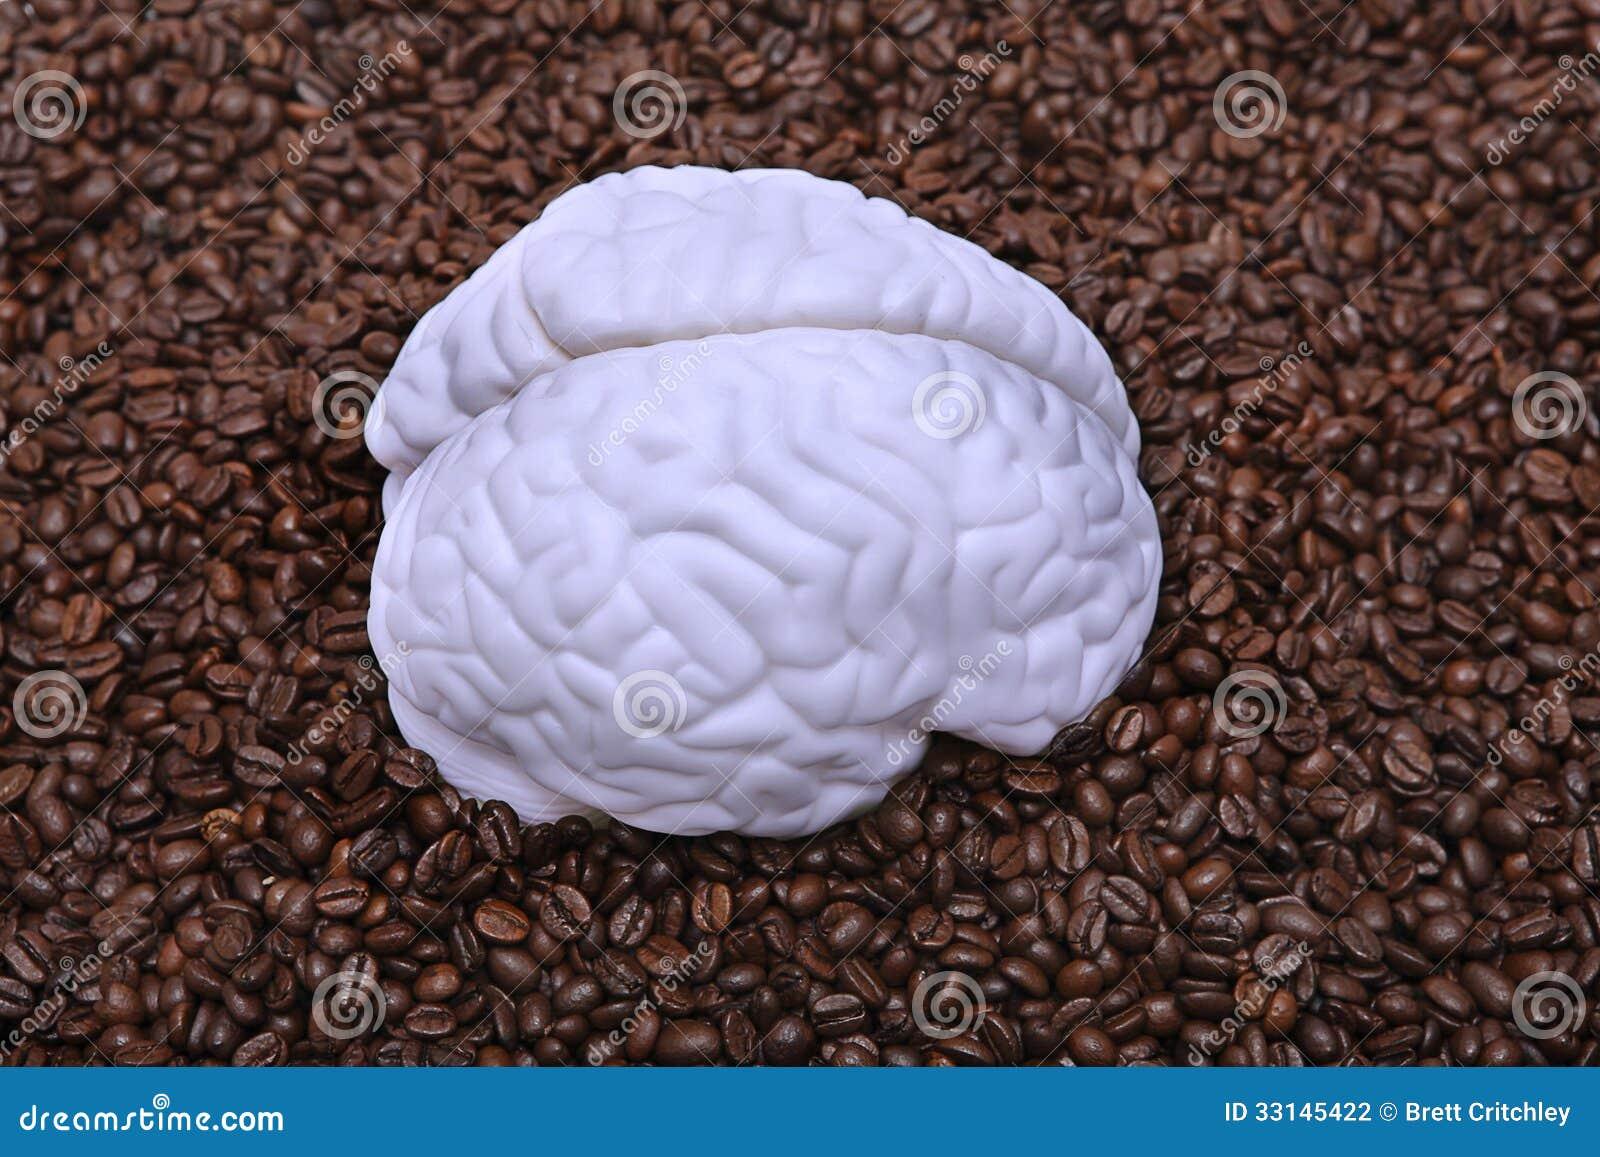 Brain on coffee beans